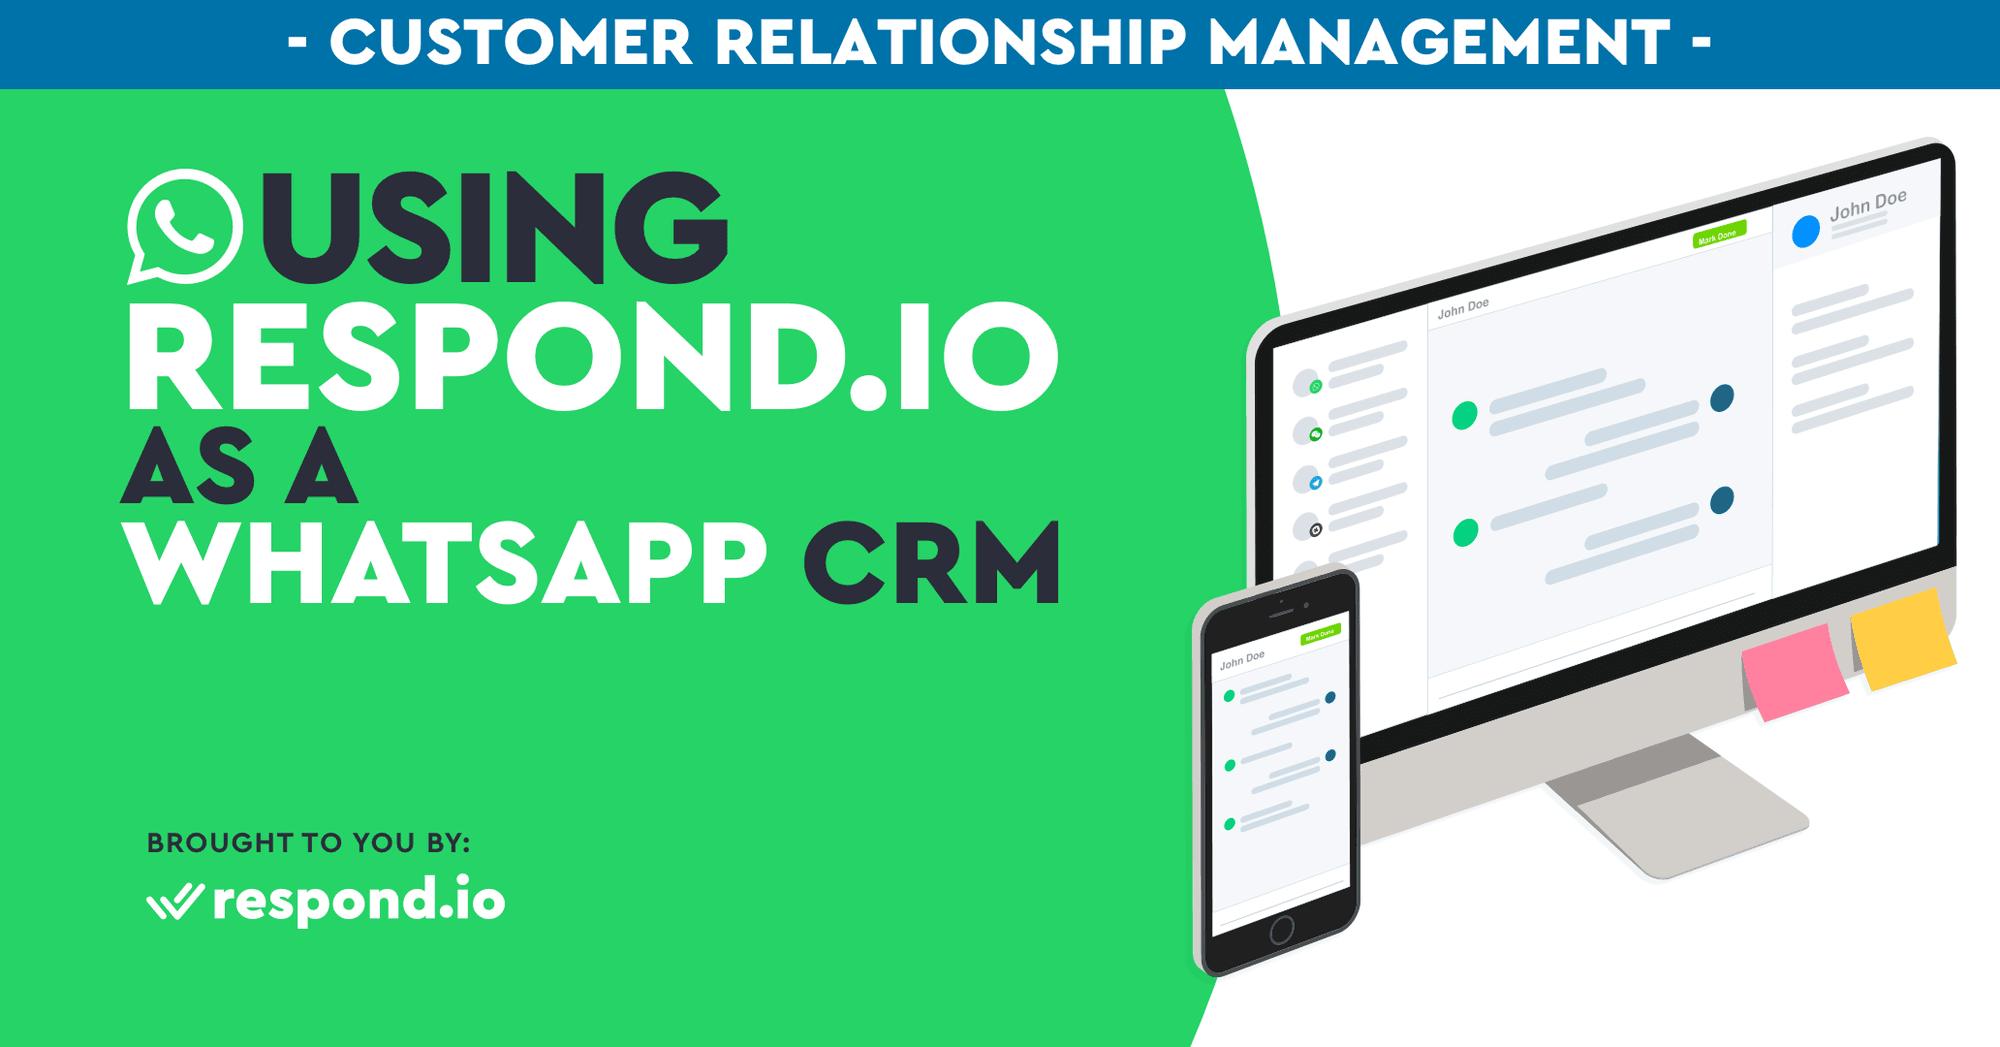 WhatsApp CRM: Using Respond.io As a CRM with WhatsApp Integration (Jul 2021)